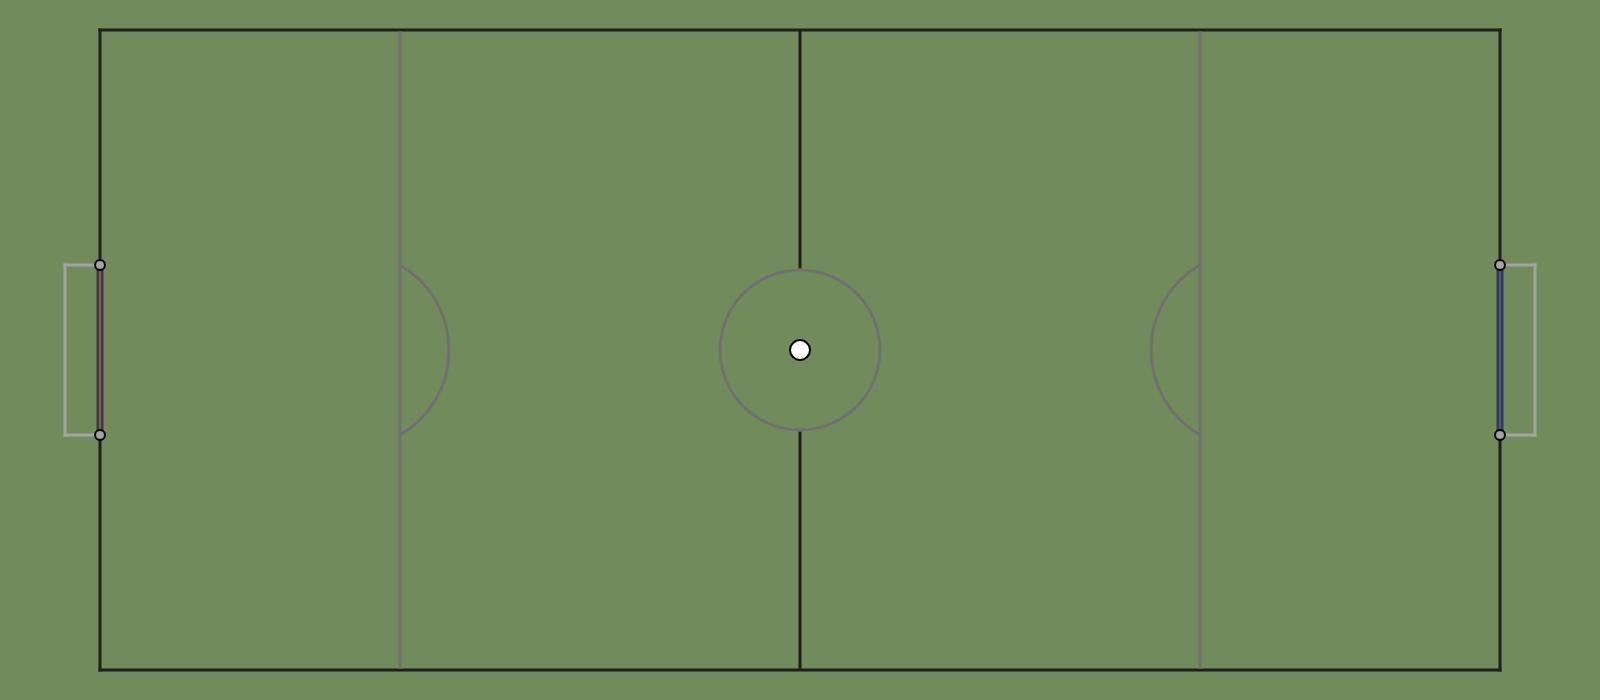 hax ball maps | TAF Futsal Sanatı v4 The Art of Futsal